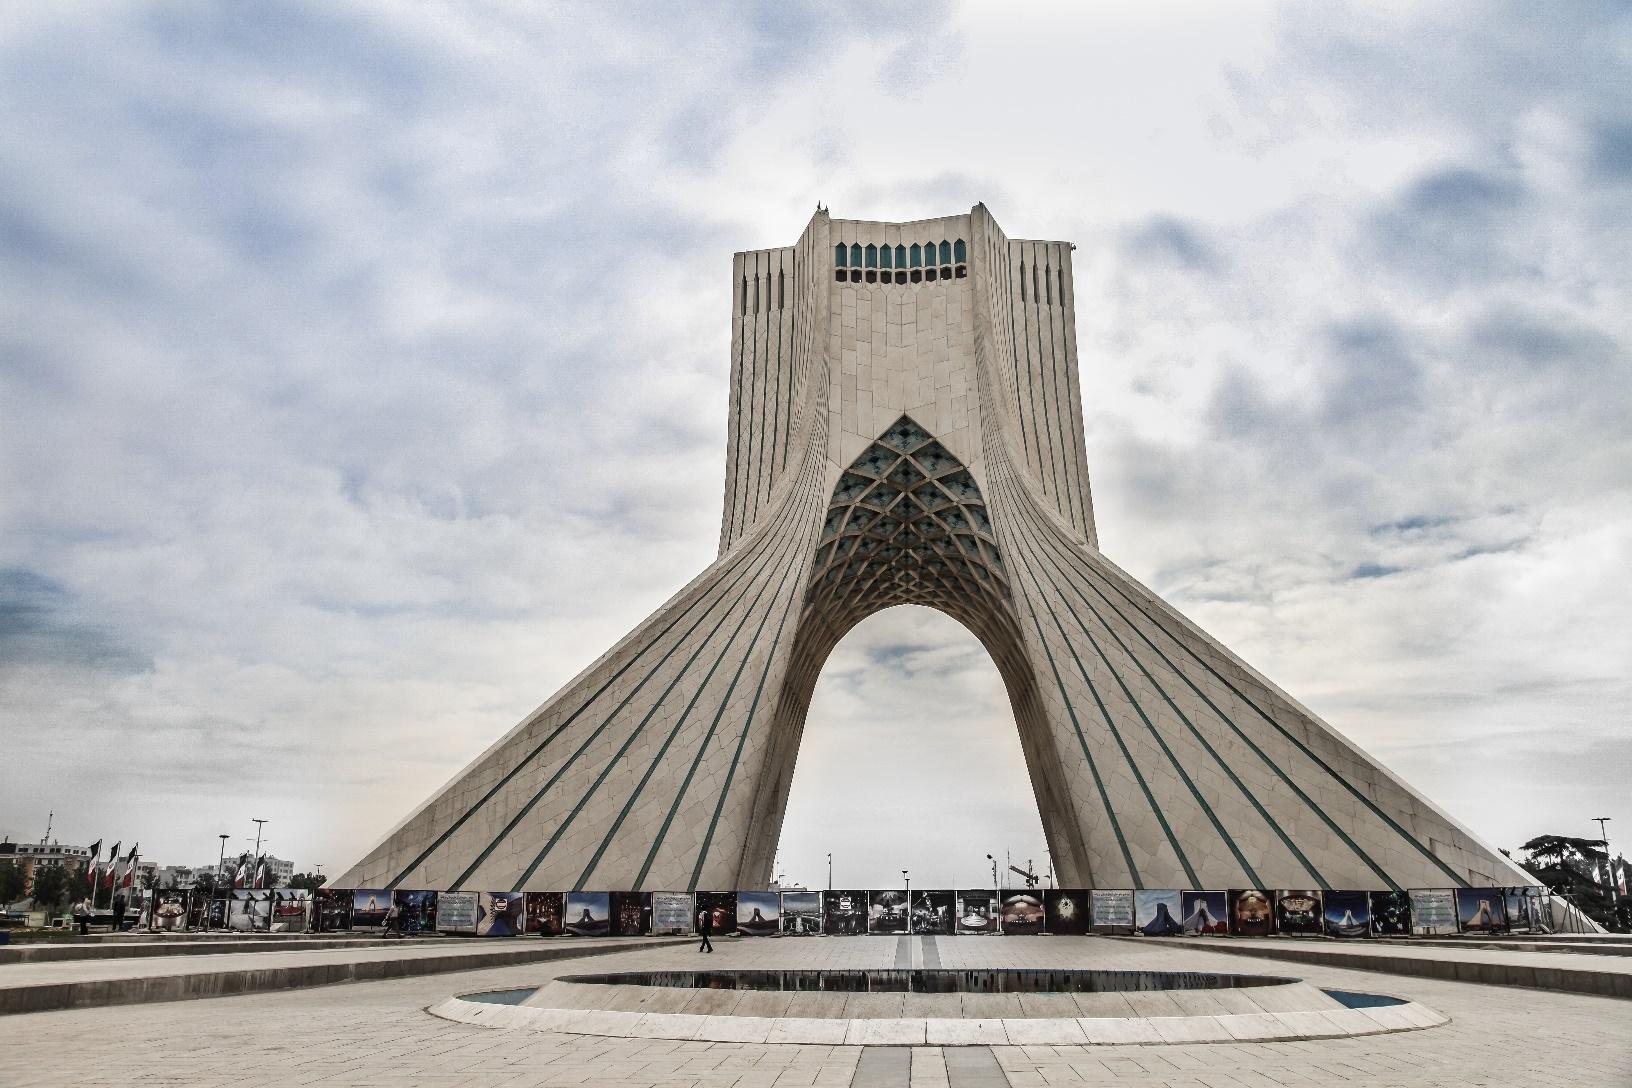 ¿Cómo planea Teherán controlar Siria? – Por Jonathan Spyer (Middle East Forum)